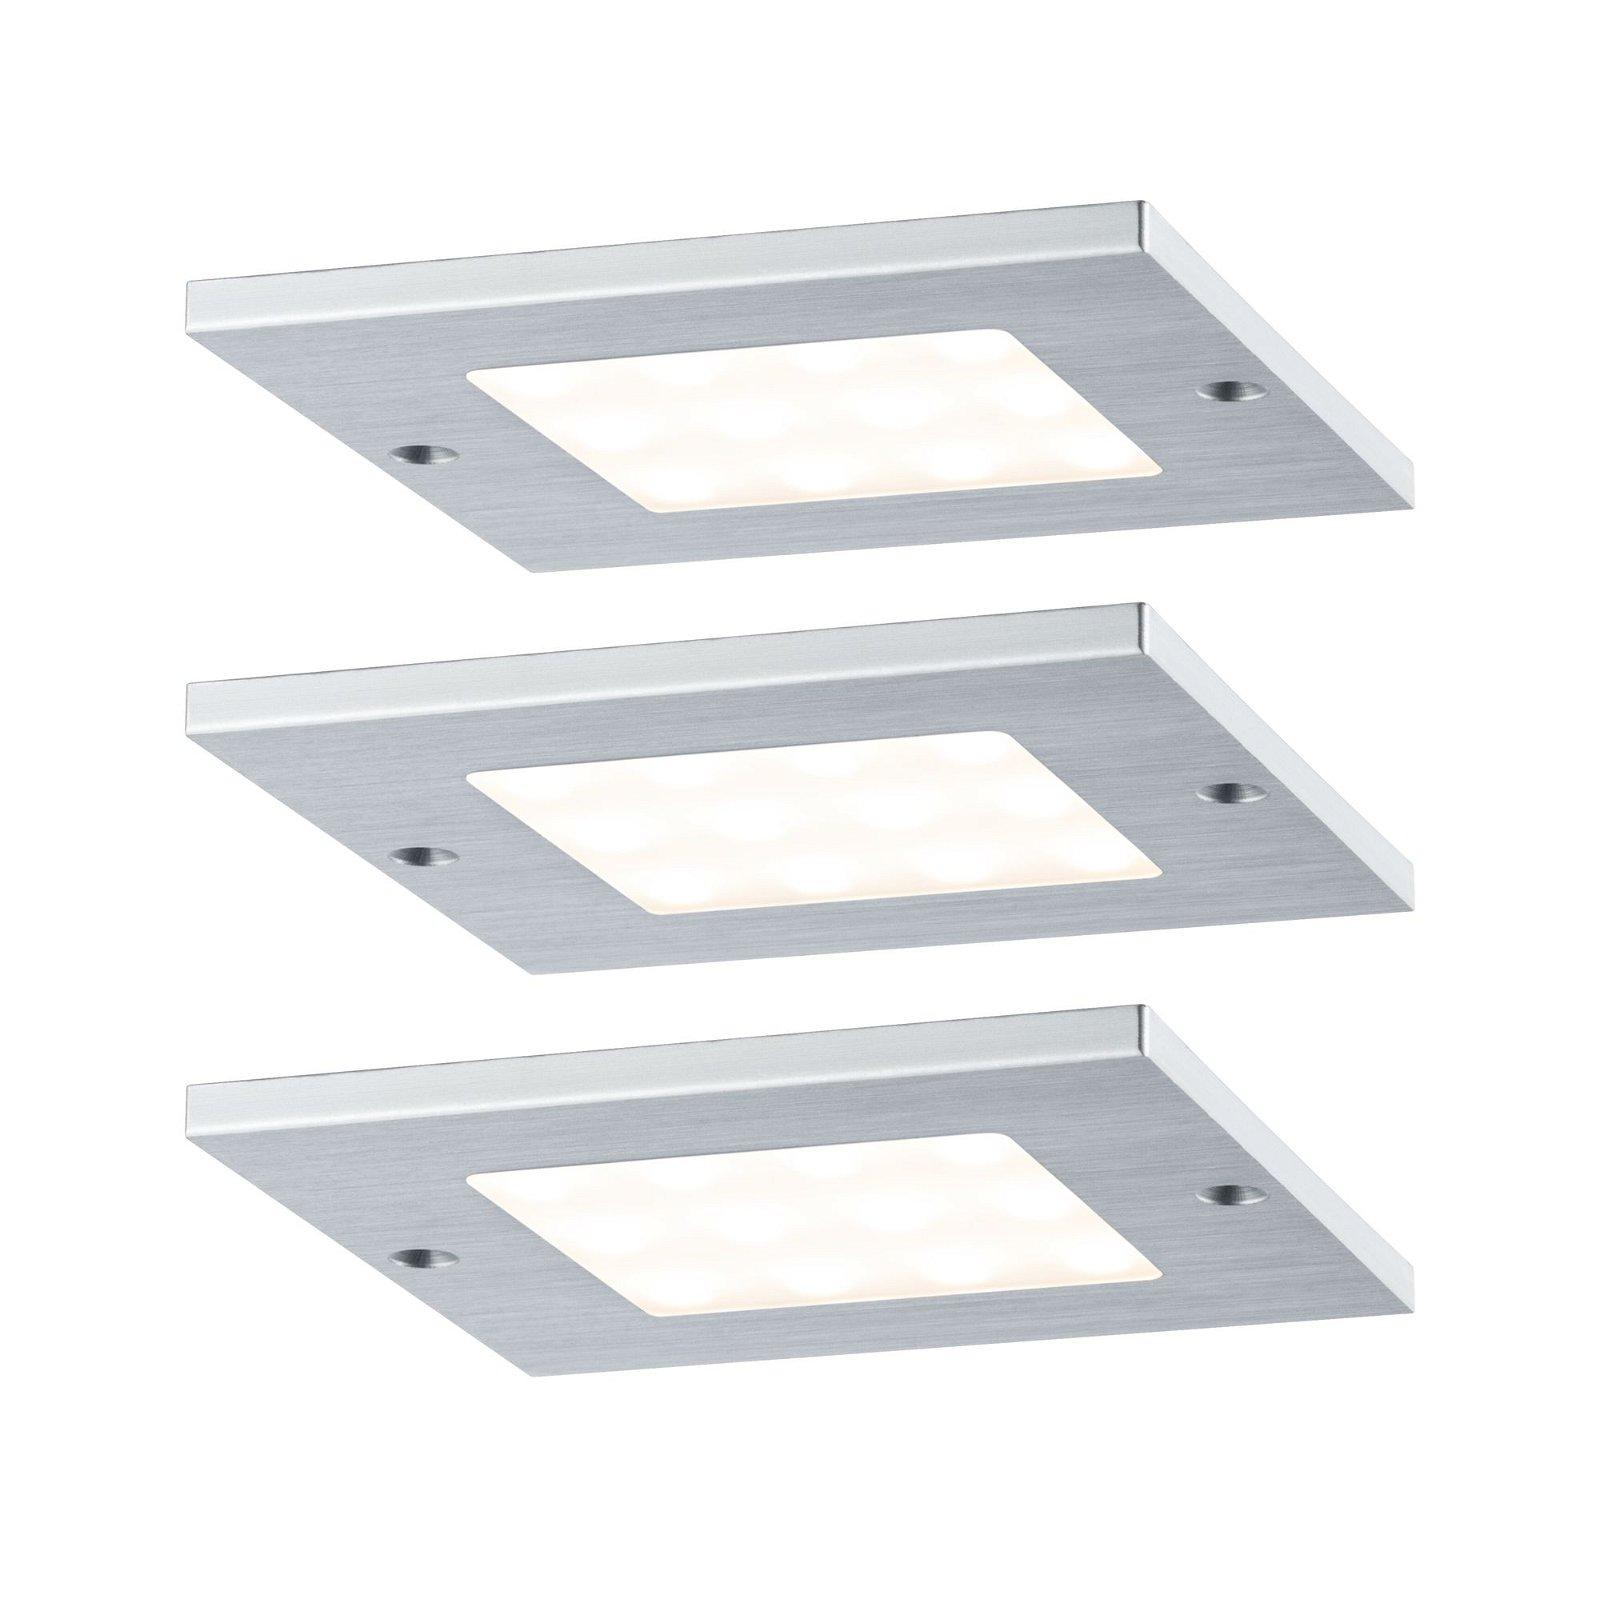 LED-onderkastverlichting Leaf 3x4,7W 80x80mm 3x310lm 230/12V hoekig Alu geborsteld